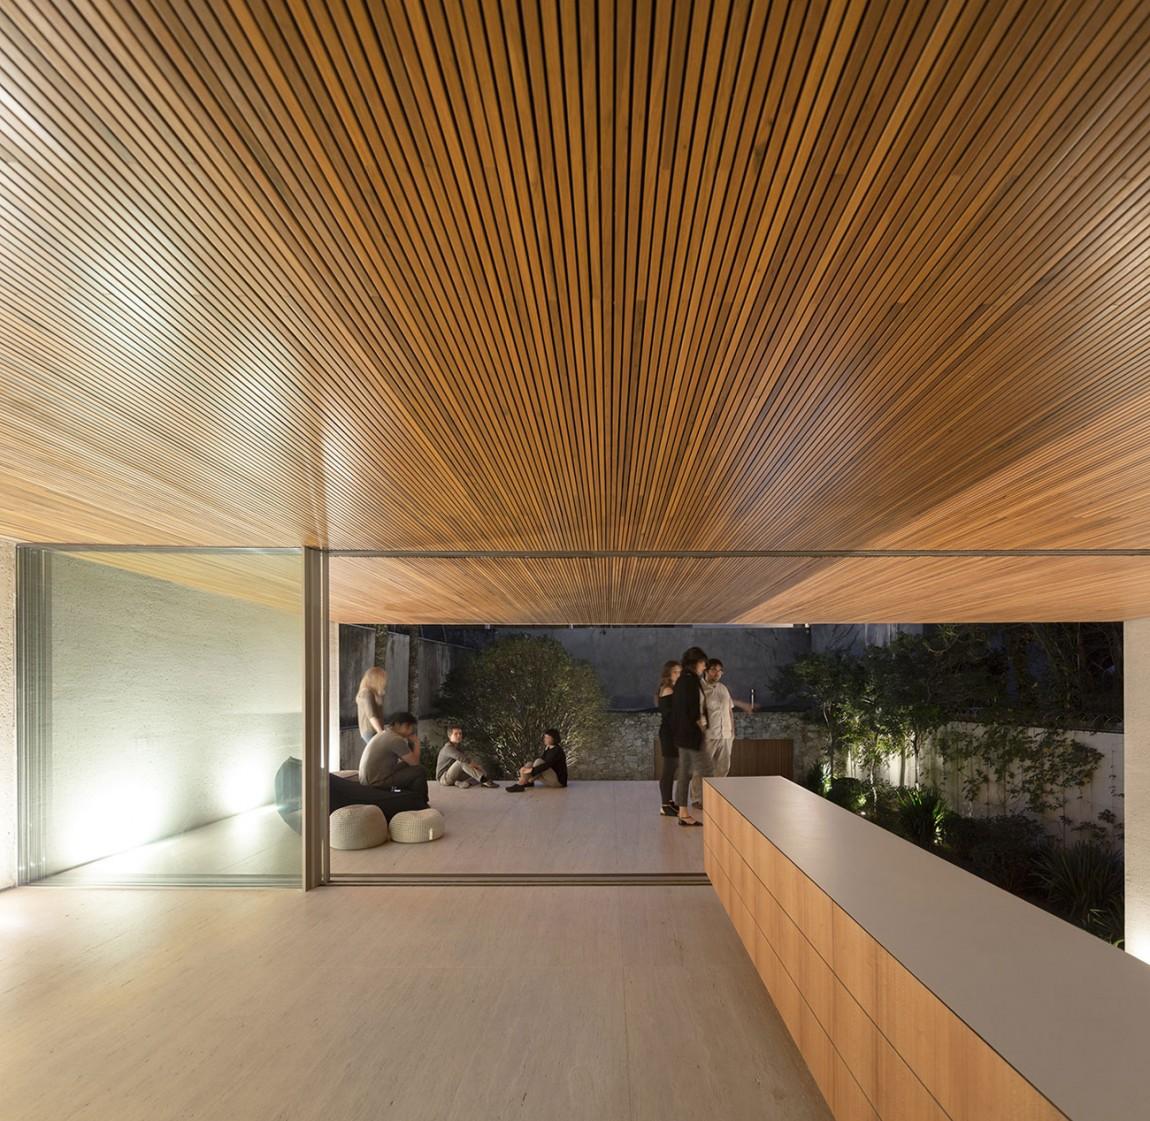 Cool Cozy Homes: Tetris House: A Creatively Organized Modern Brazilian Home